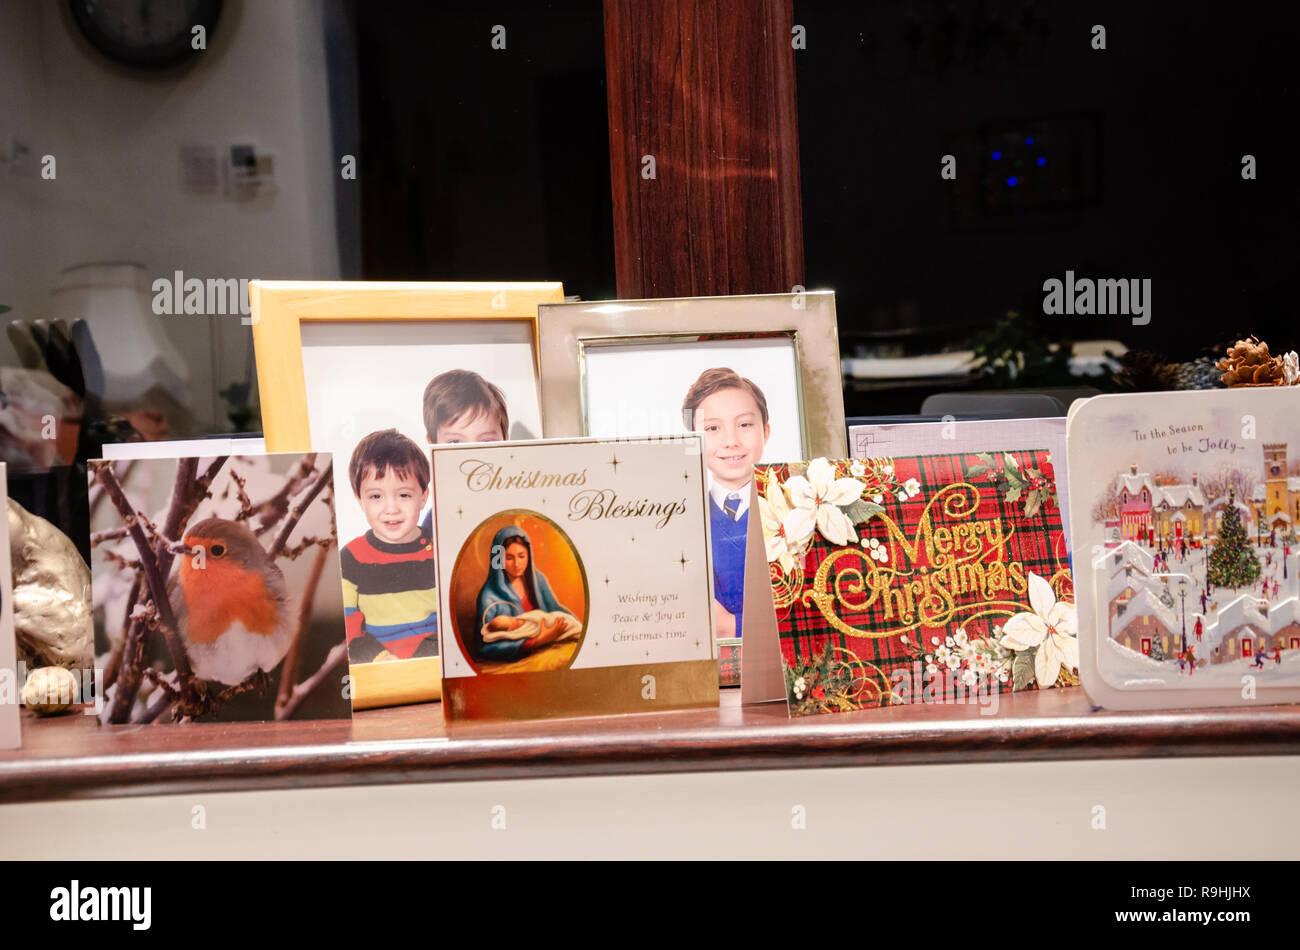 Seasonal Christmas cards on a window sill alongside family photos. - Stock Image